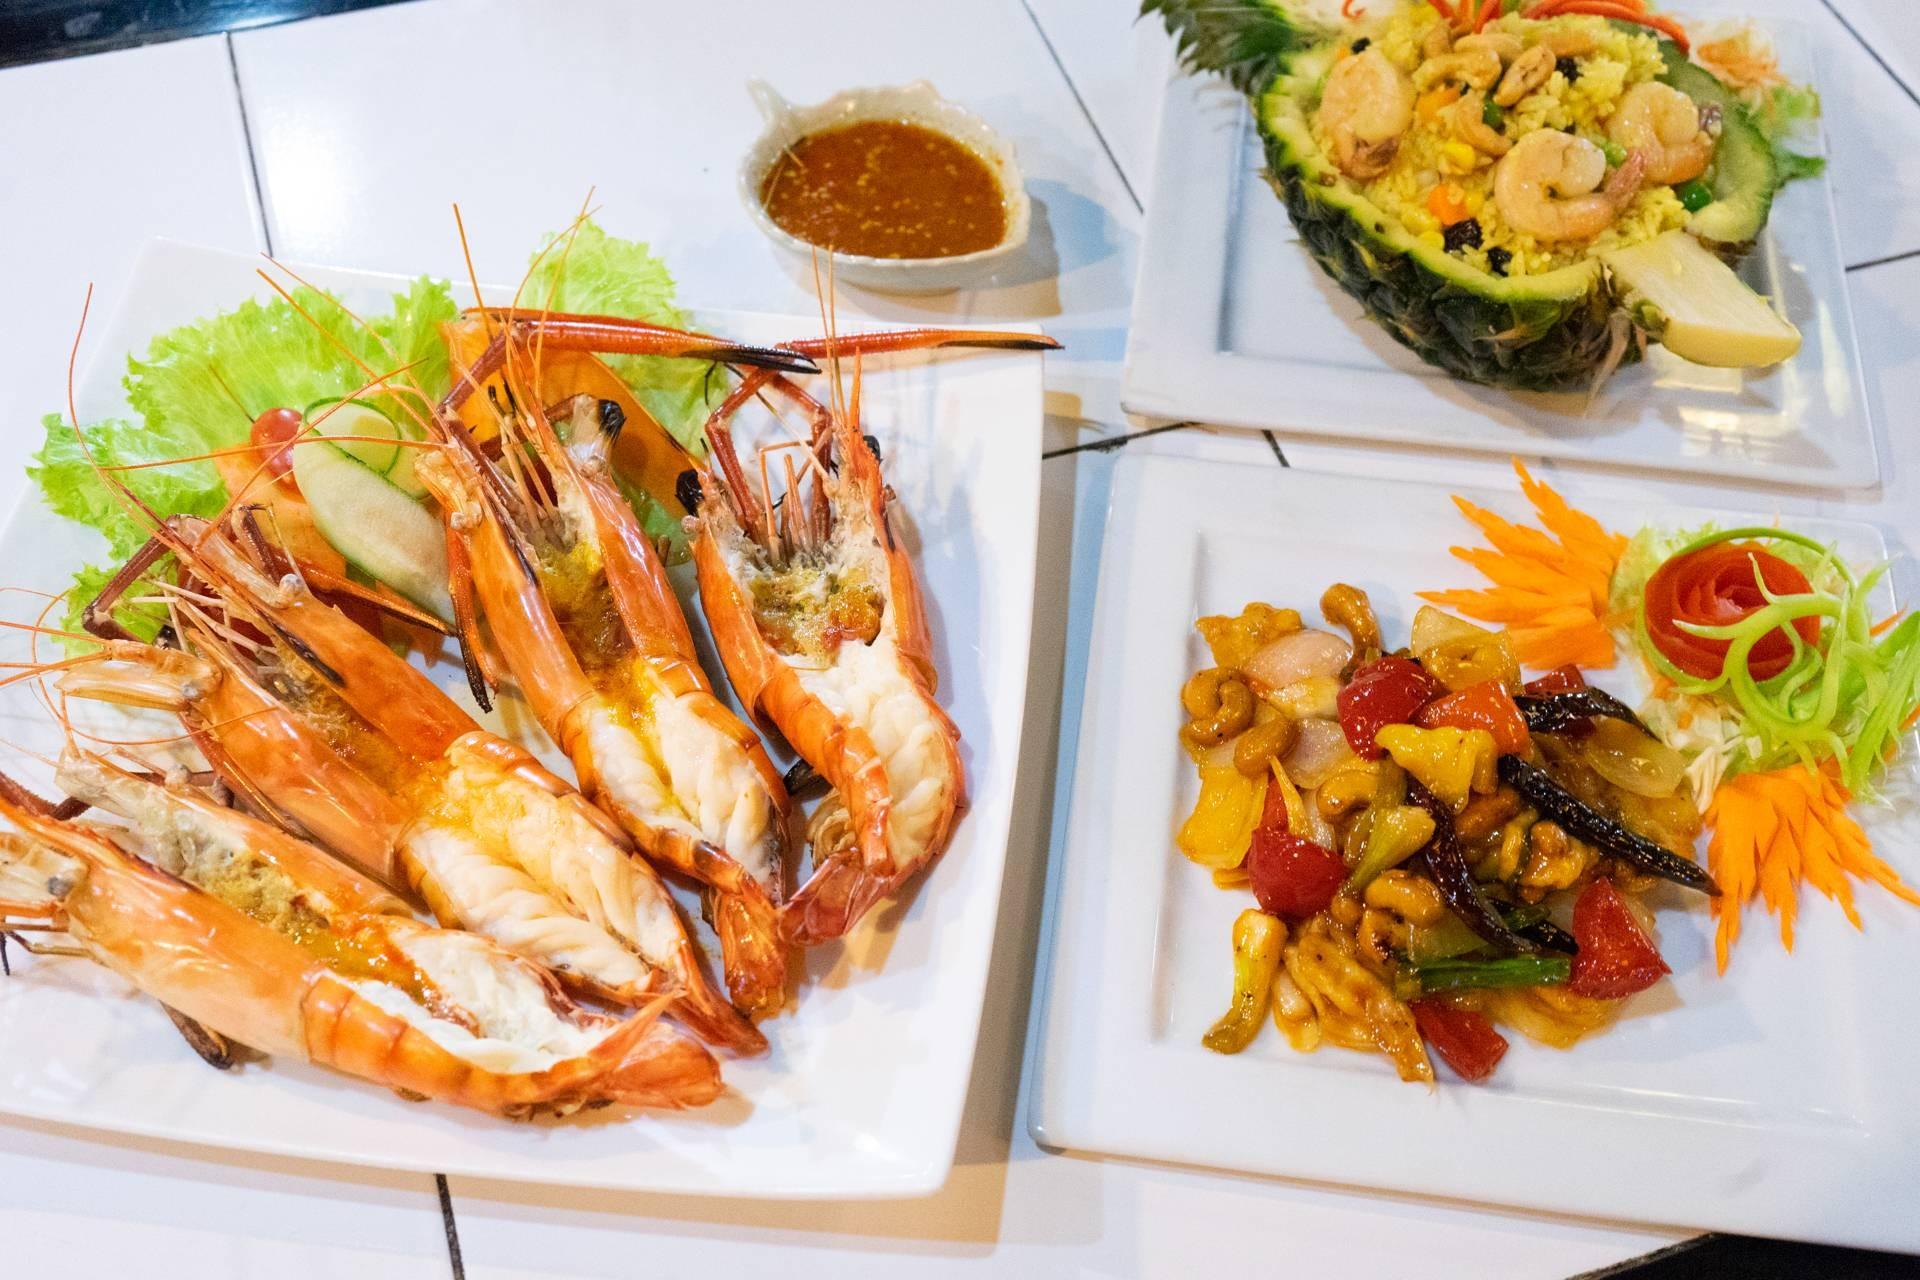 The Roadside Pub & Restaurant Chiangmai